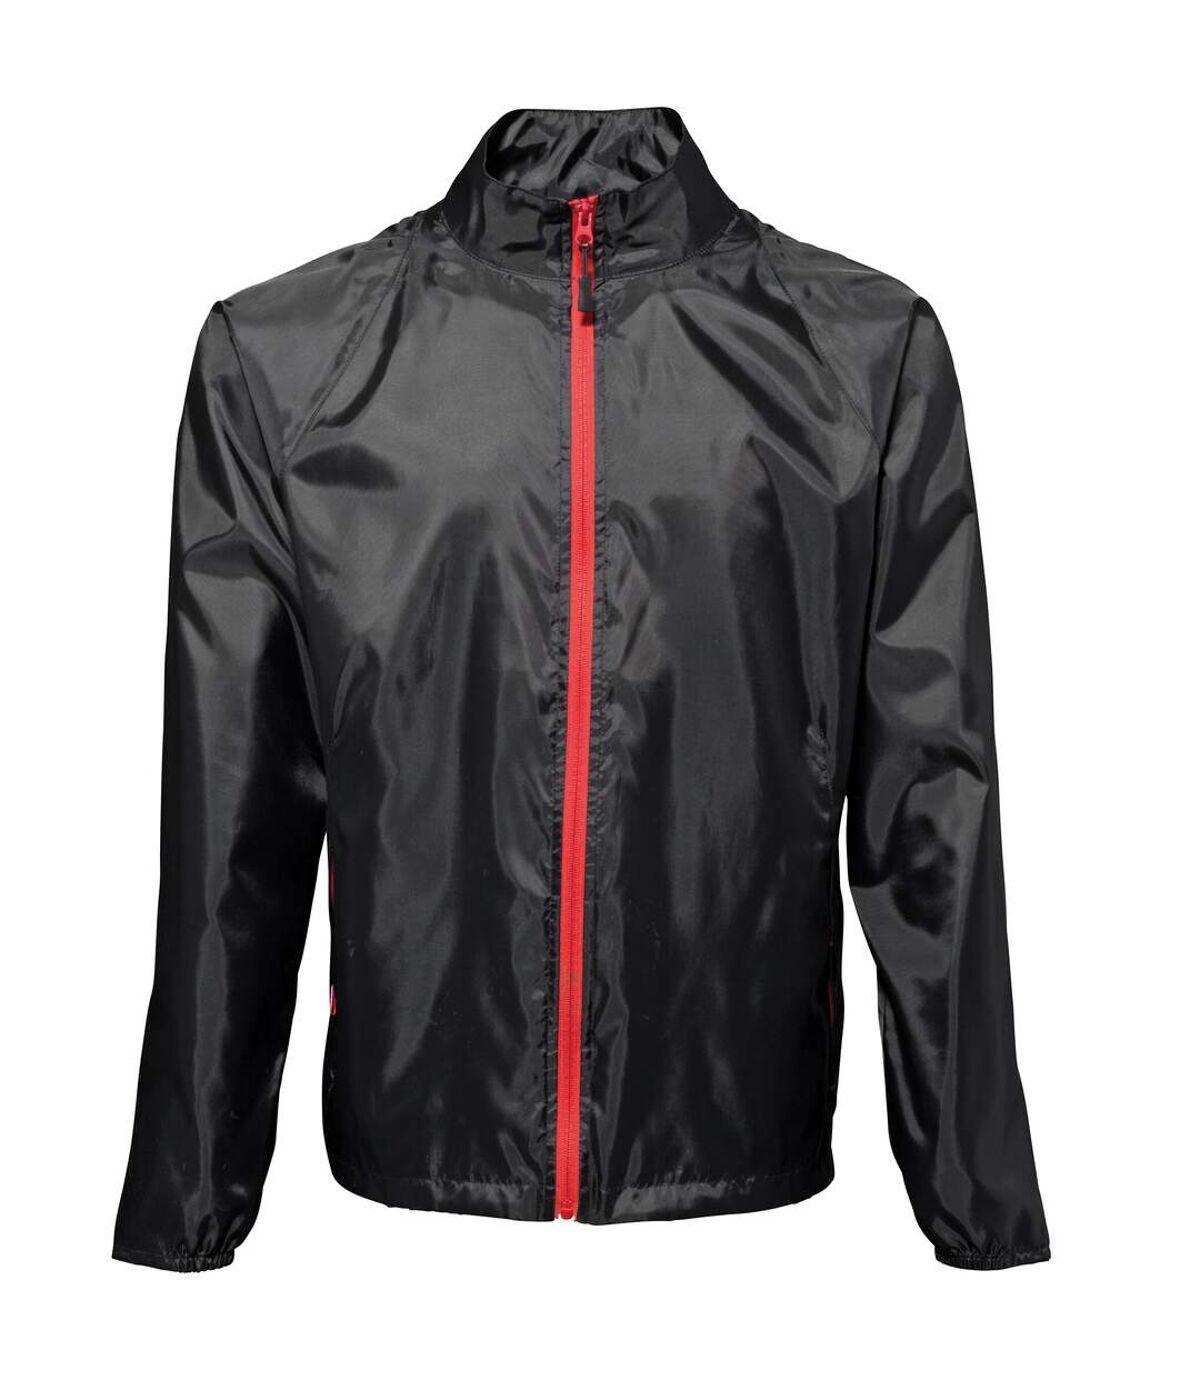 2786 Mens Contrast Lightweight Windcheater Shower Proof Jacket (Pack of 2) (Black/ Red) - UTRW7001